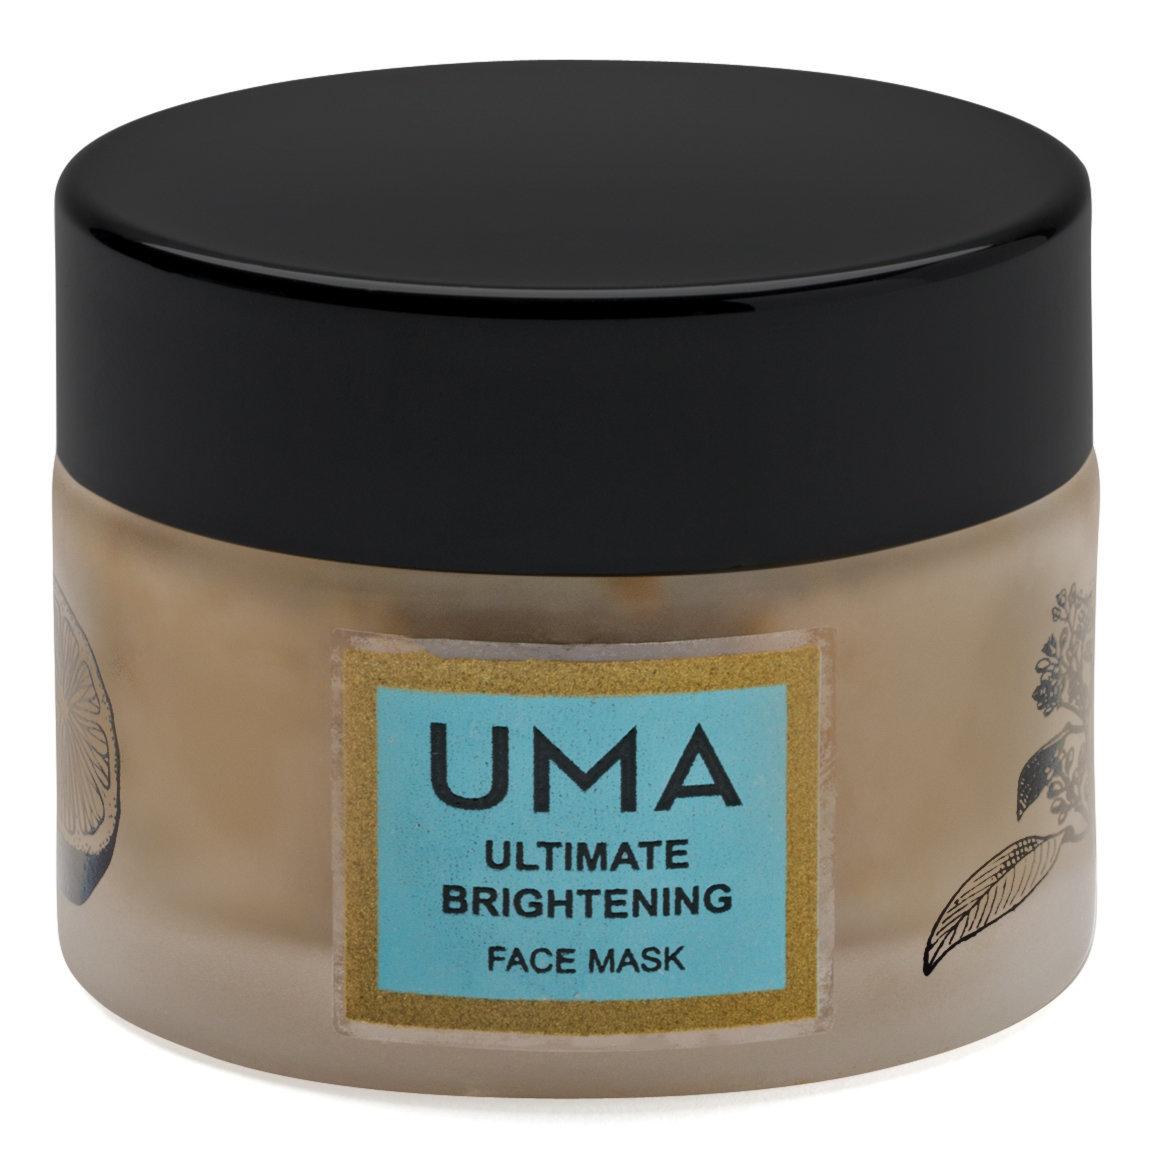 Uma Ultimate Brightening Face Mask product swatch.